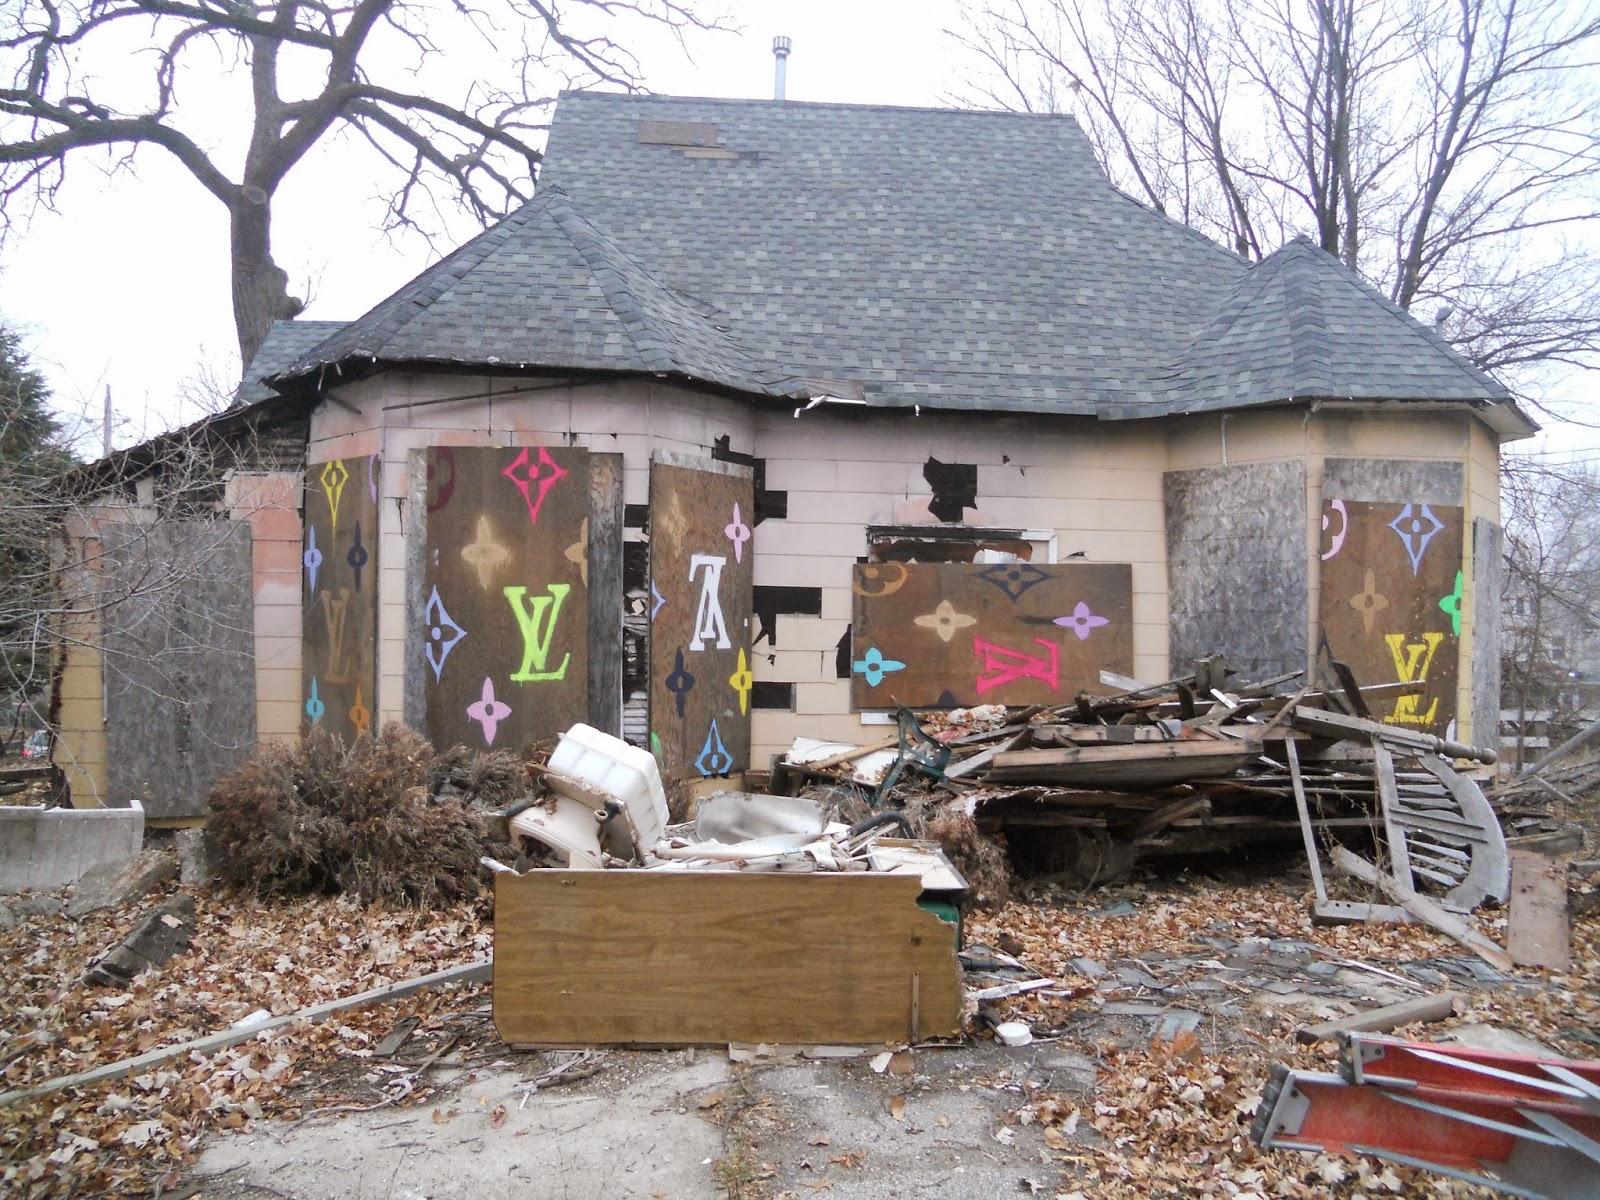 LV Crack House , 2013, Public Art Installation in Des Moines, IA, House, metal panels, enamel